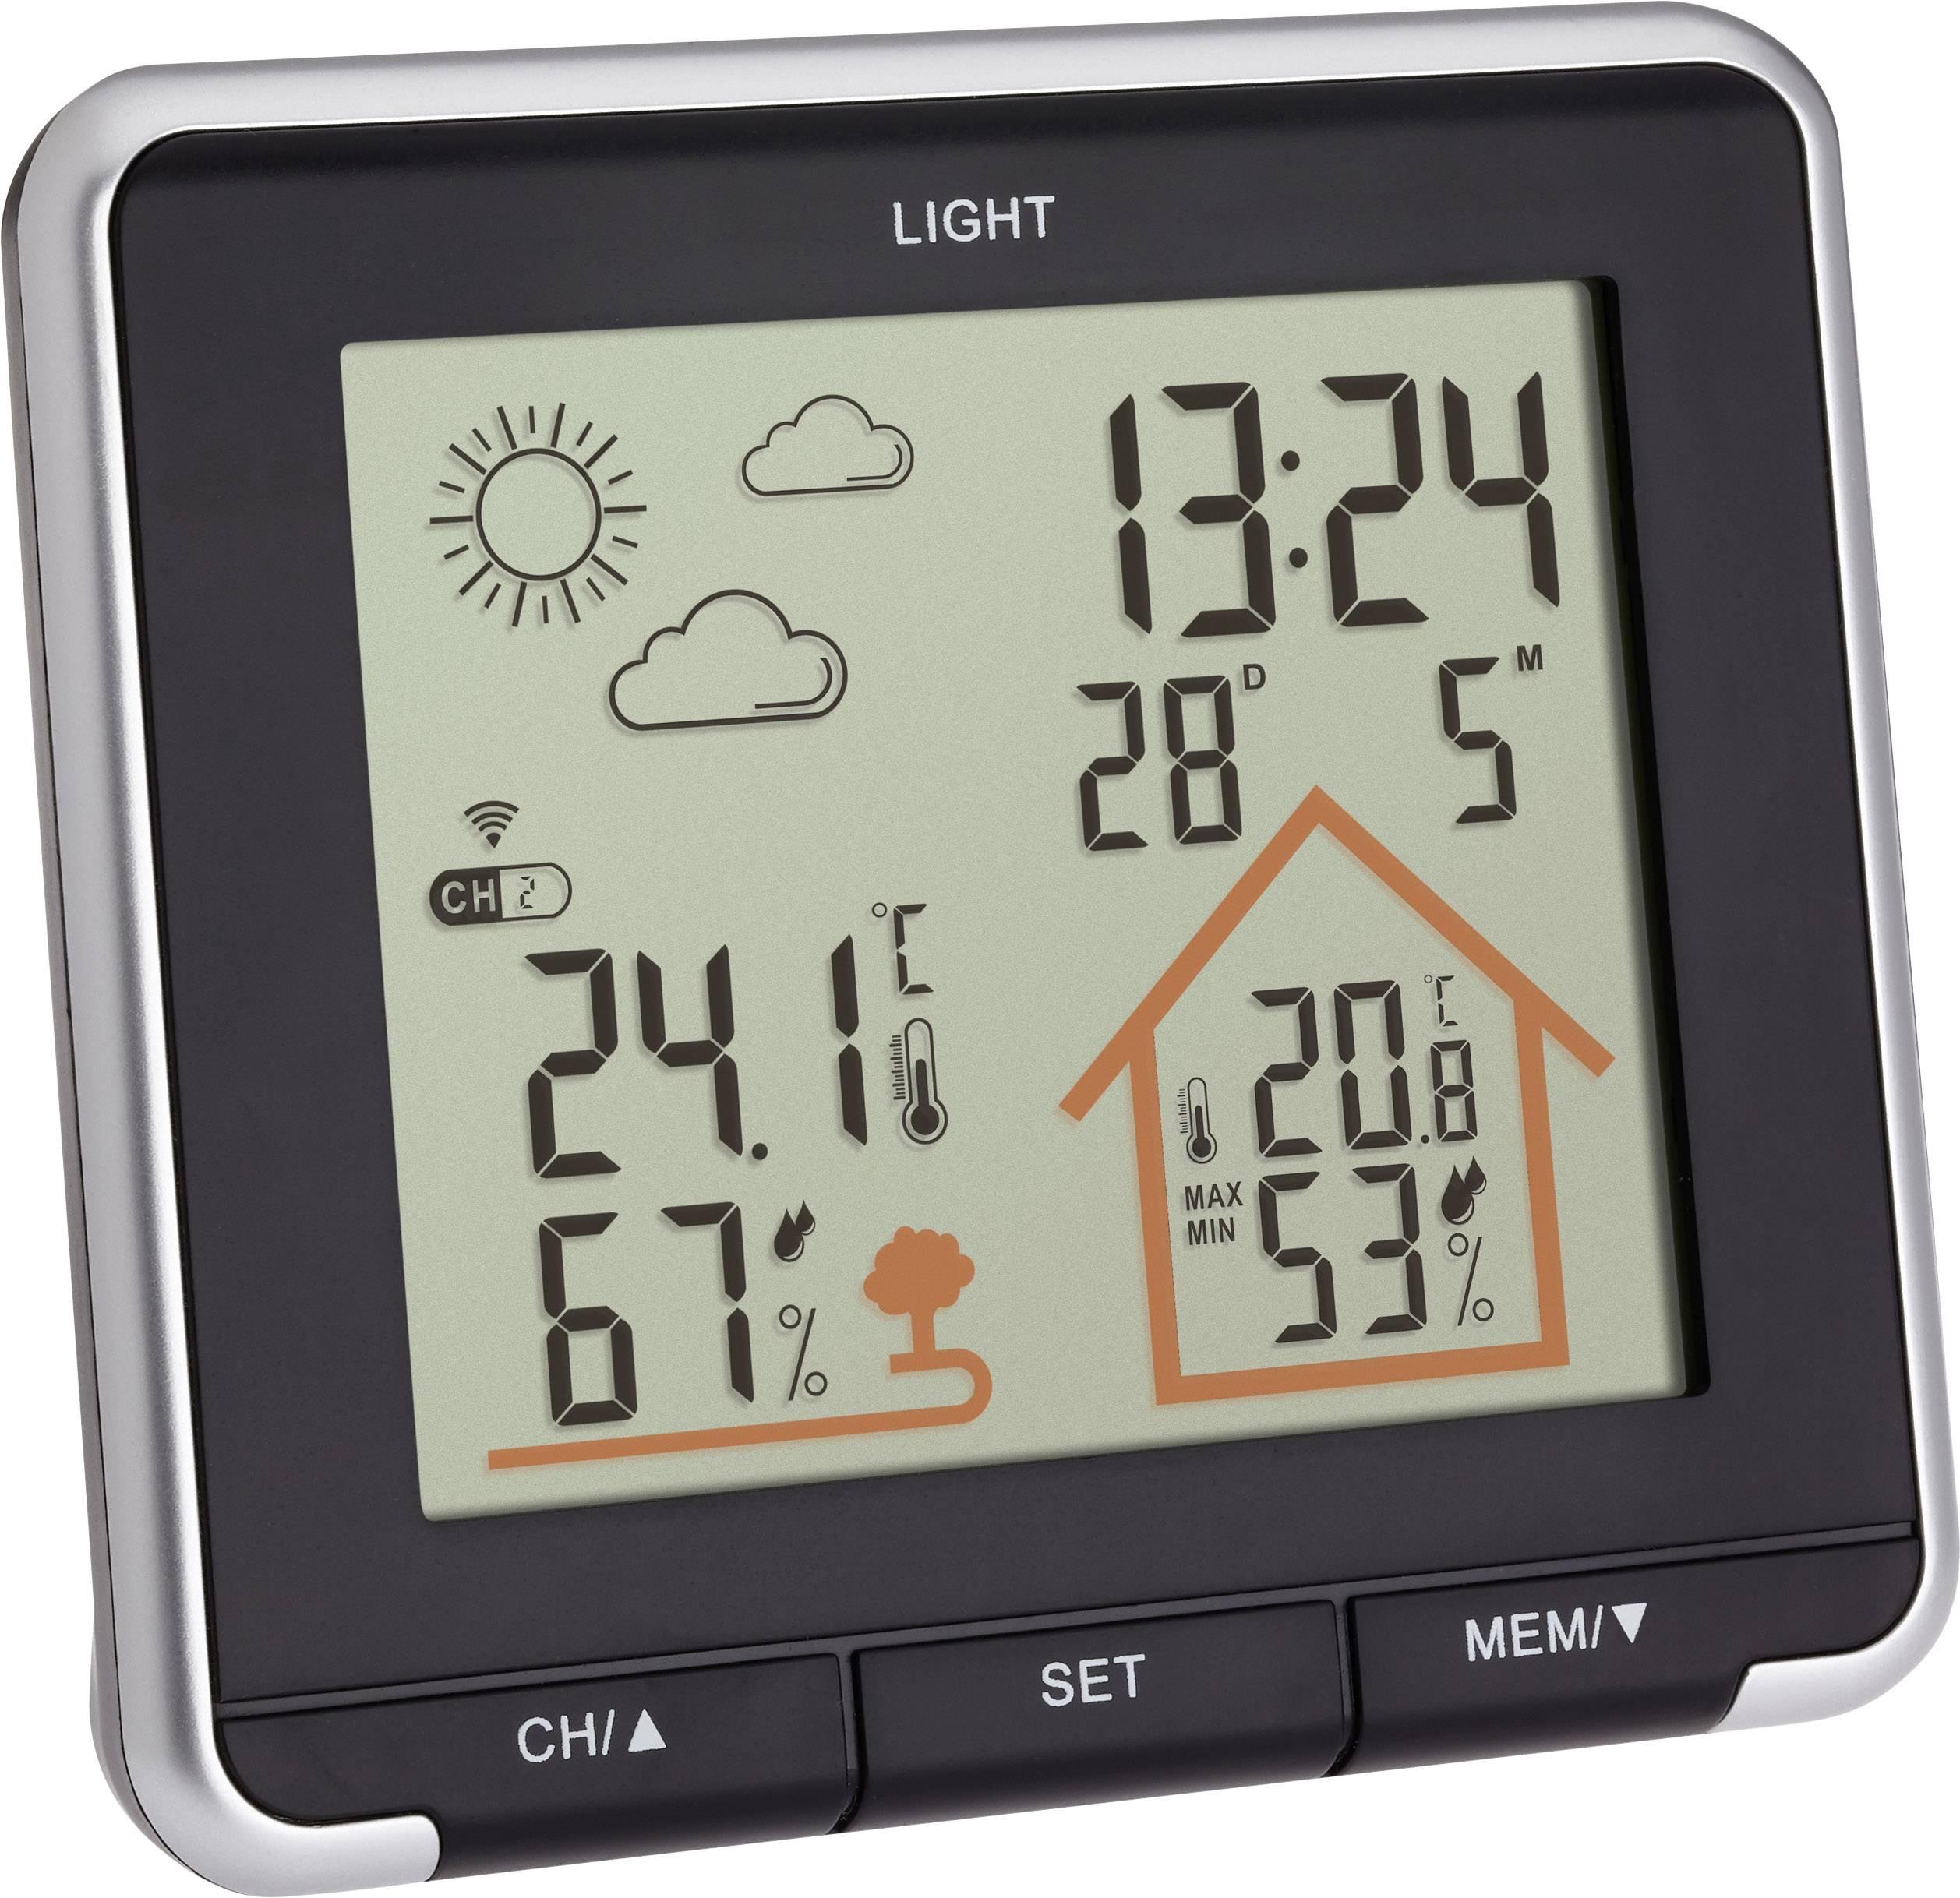 Conrad-TFA Dostmann LIFE 35.1153.01 Draadloos weerstation Voorspelling voor 12 tot 24 uur-aanbieding